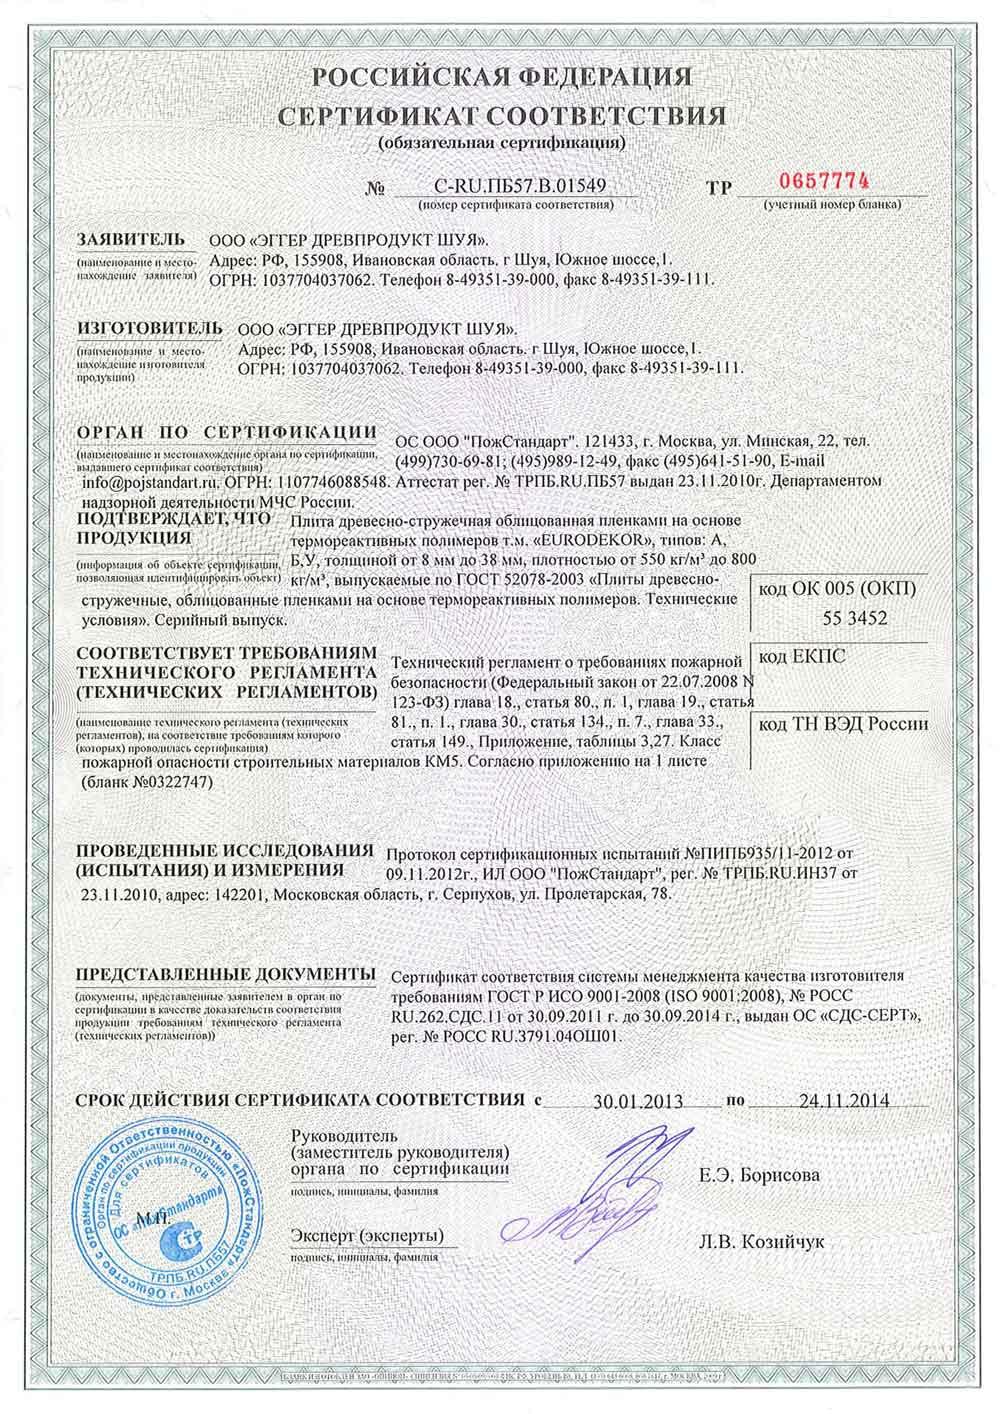 Сертификация лдсп эггер умо метрология стандартизация и сертификация